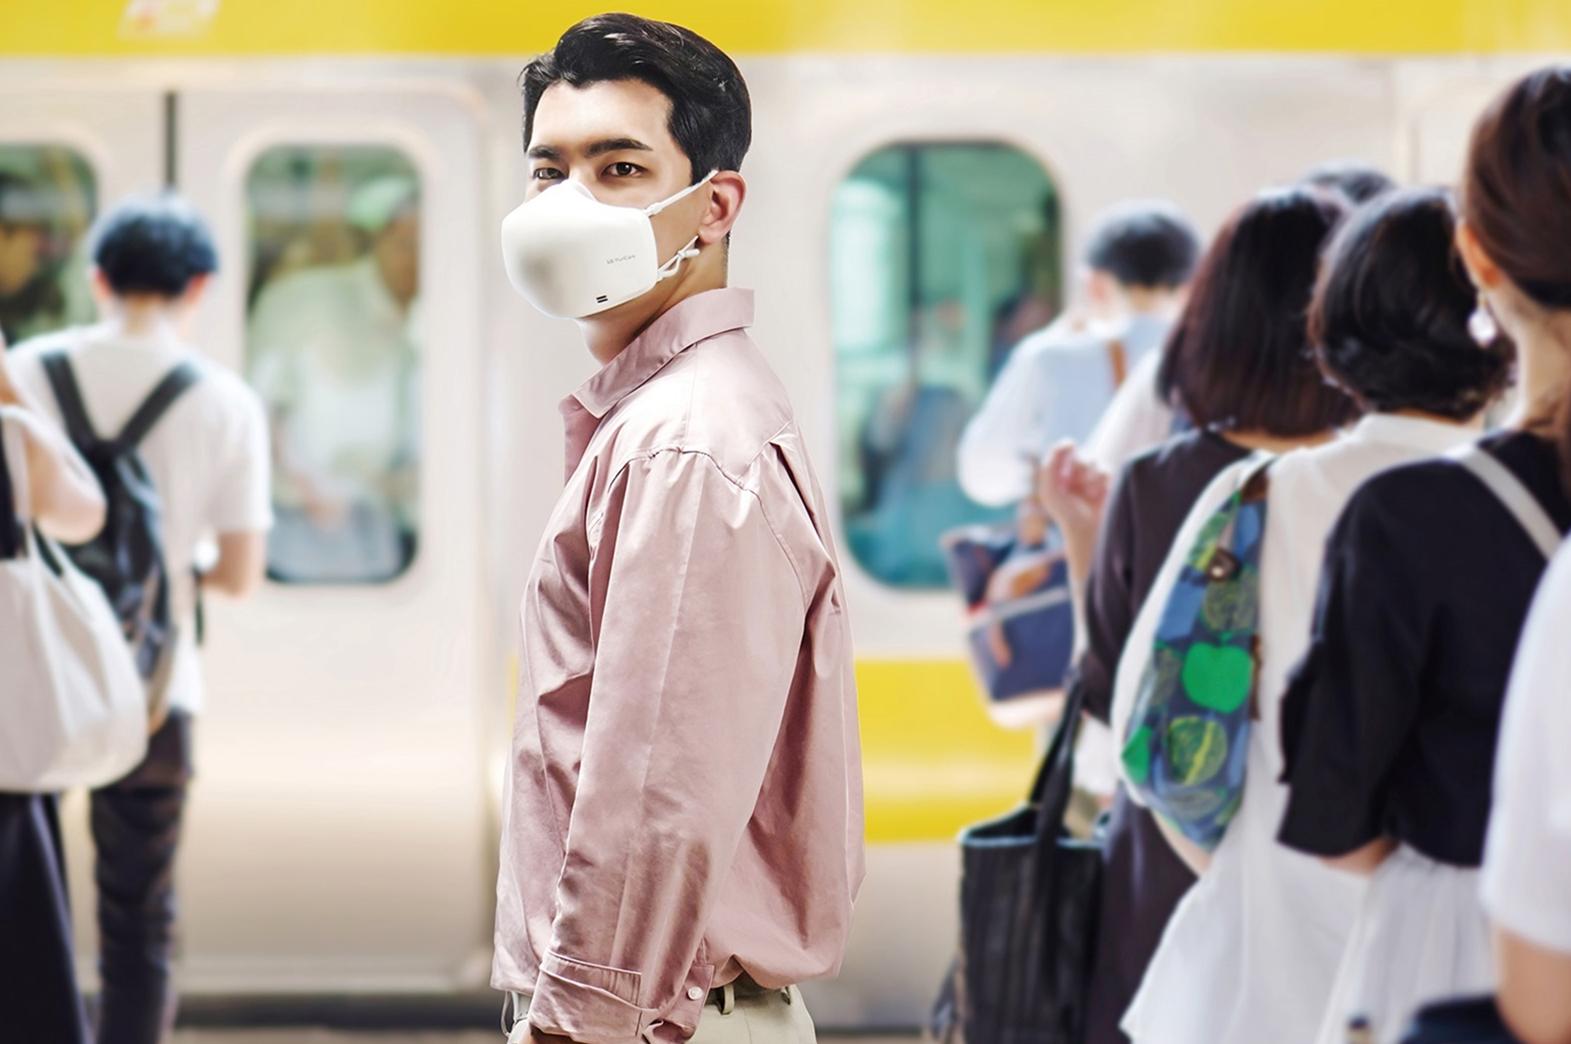 LG PuriCare™ 口罩型空氣清淨機第二代 全新升級上市 @3C 達人廖阿輝